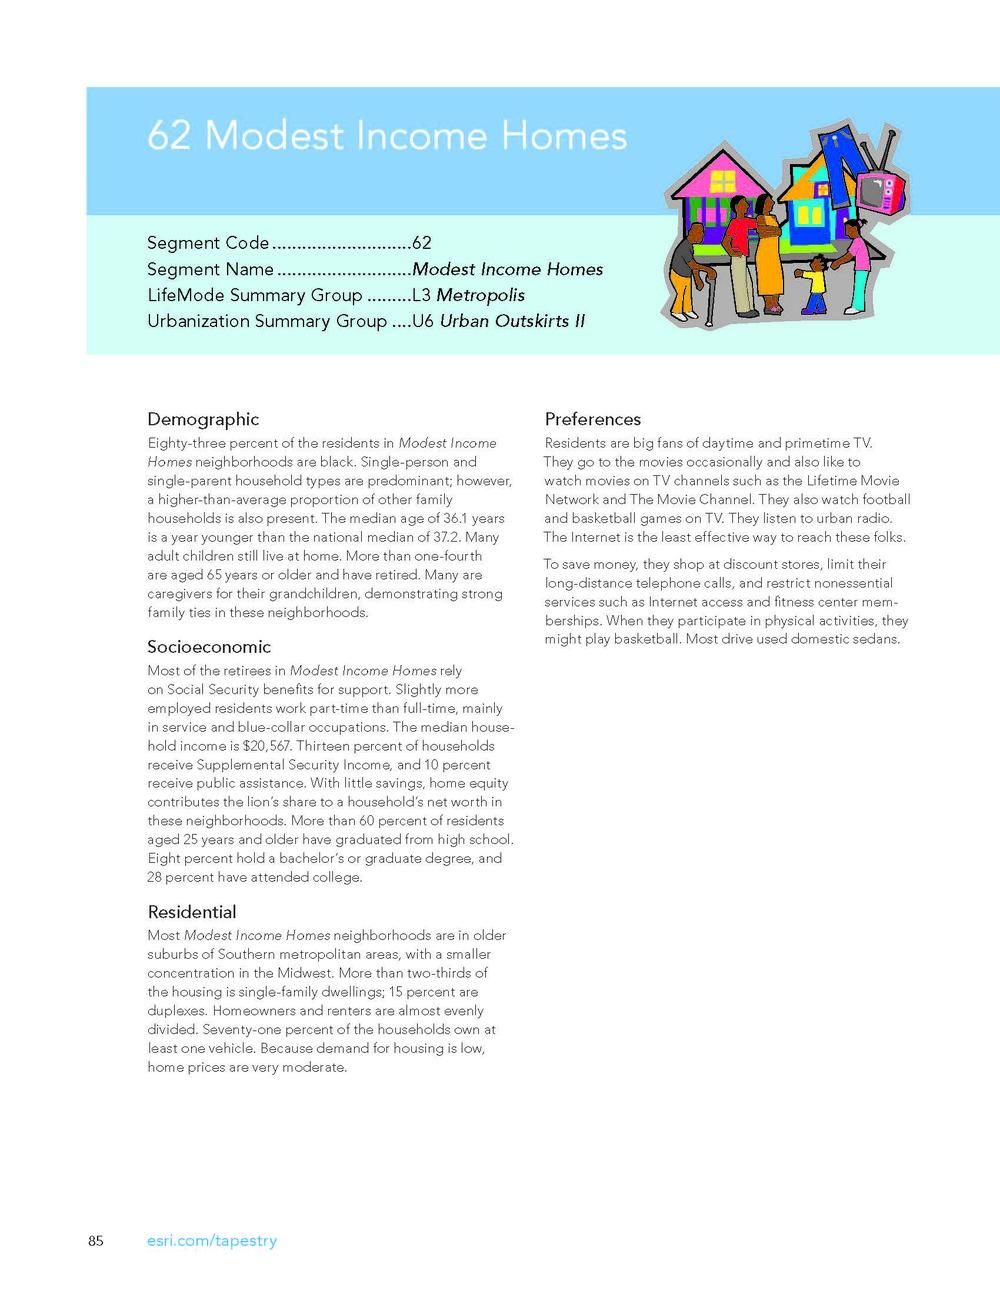 tapestry-segmentation_Page_88.jpg